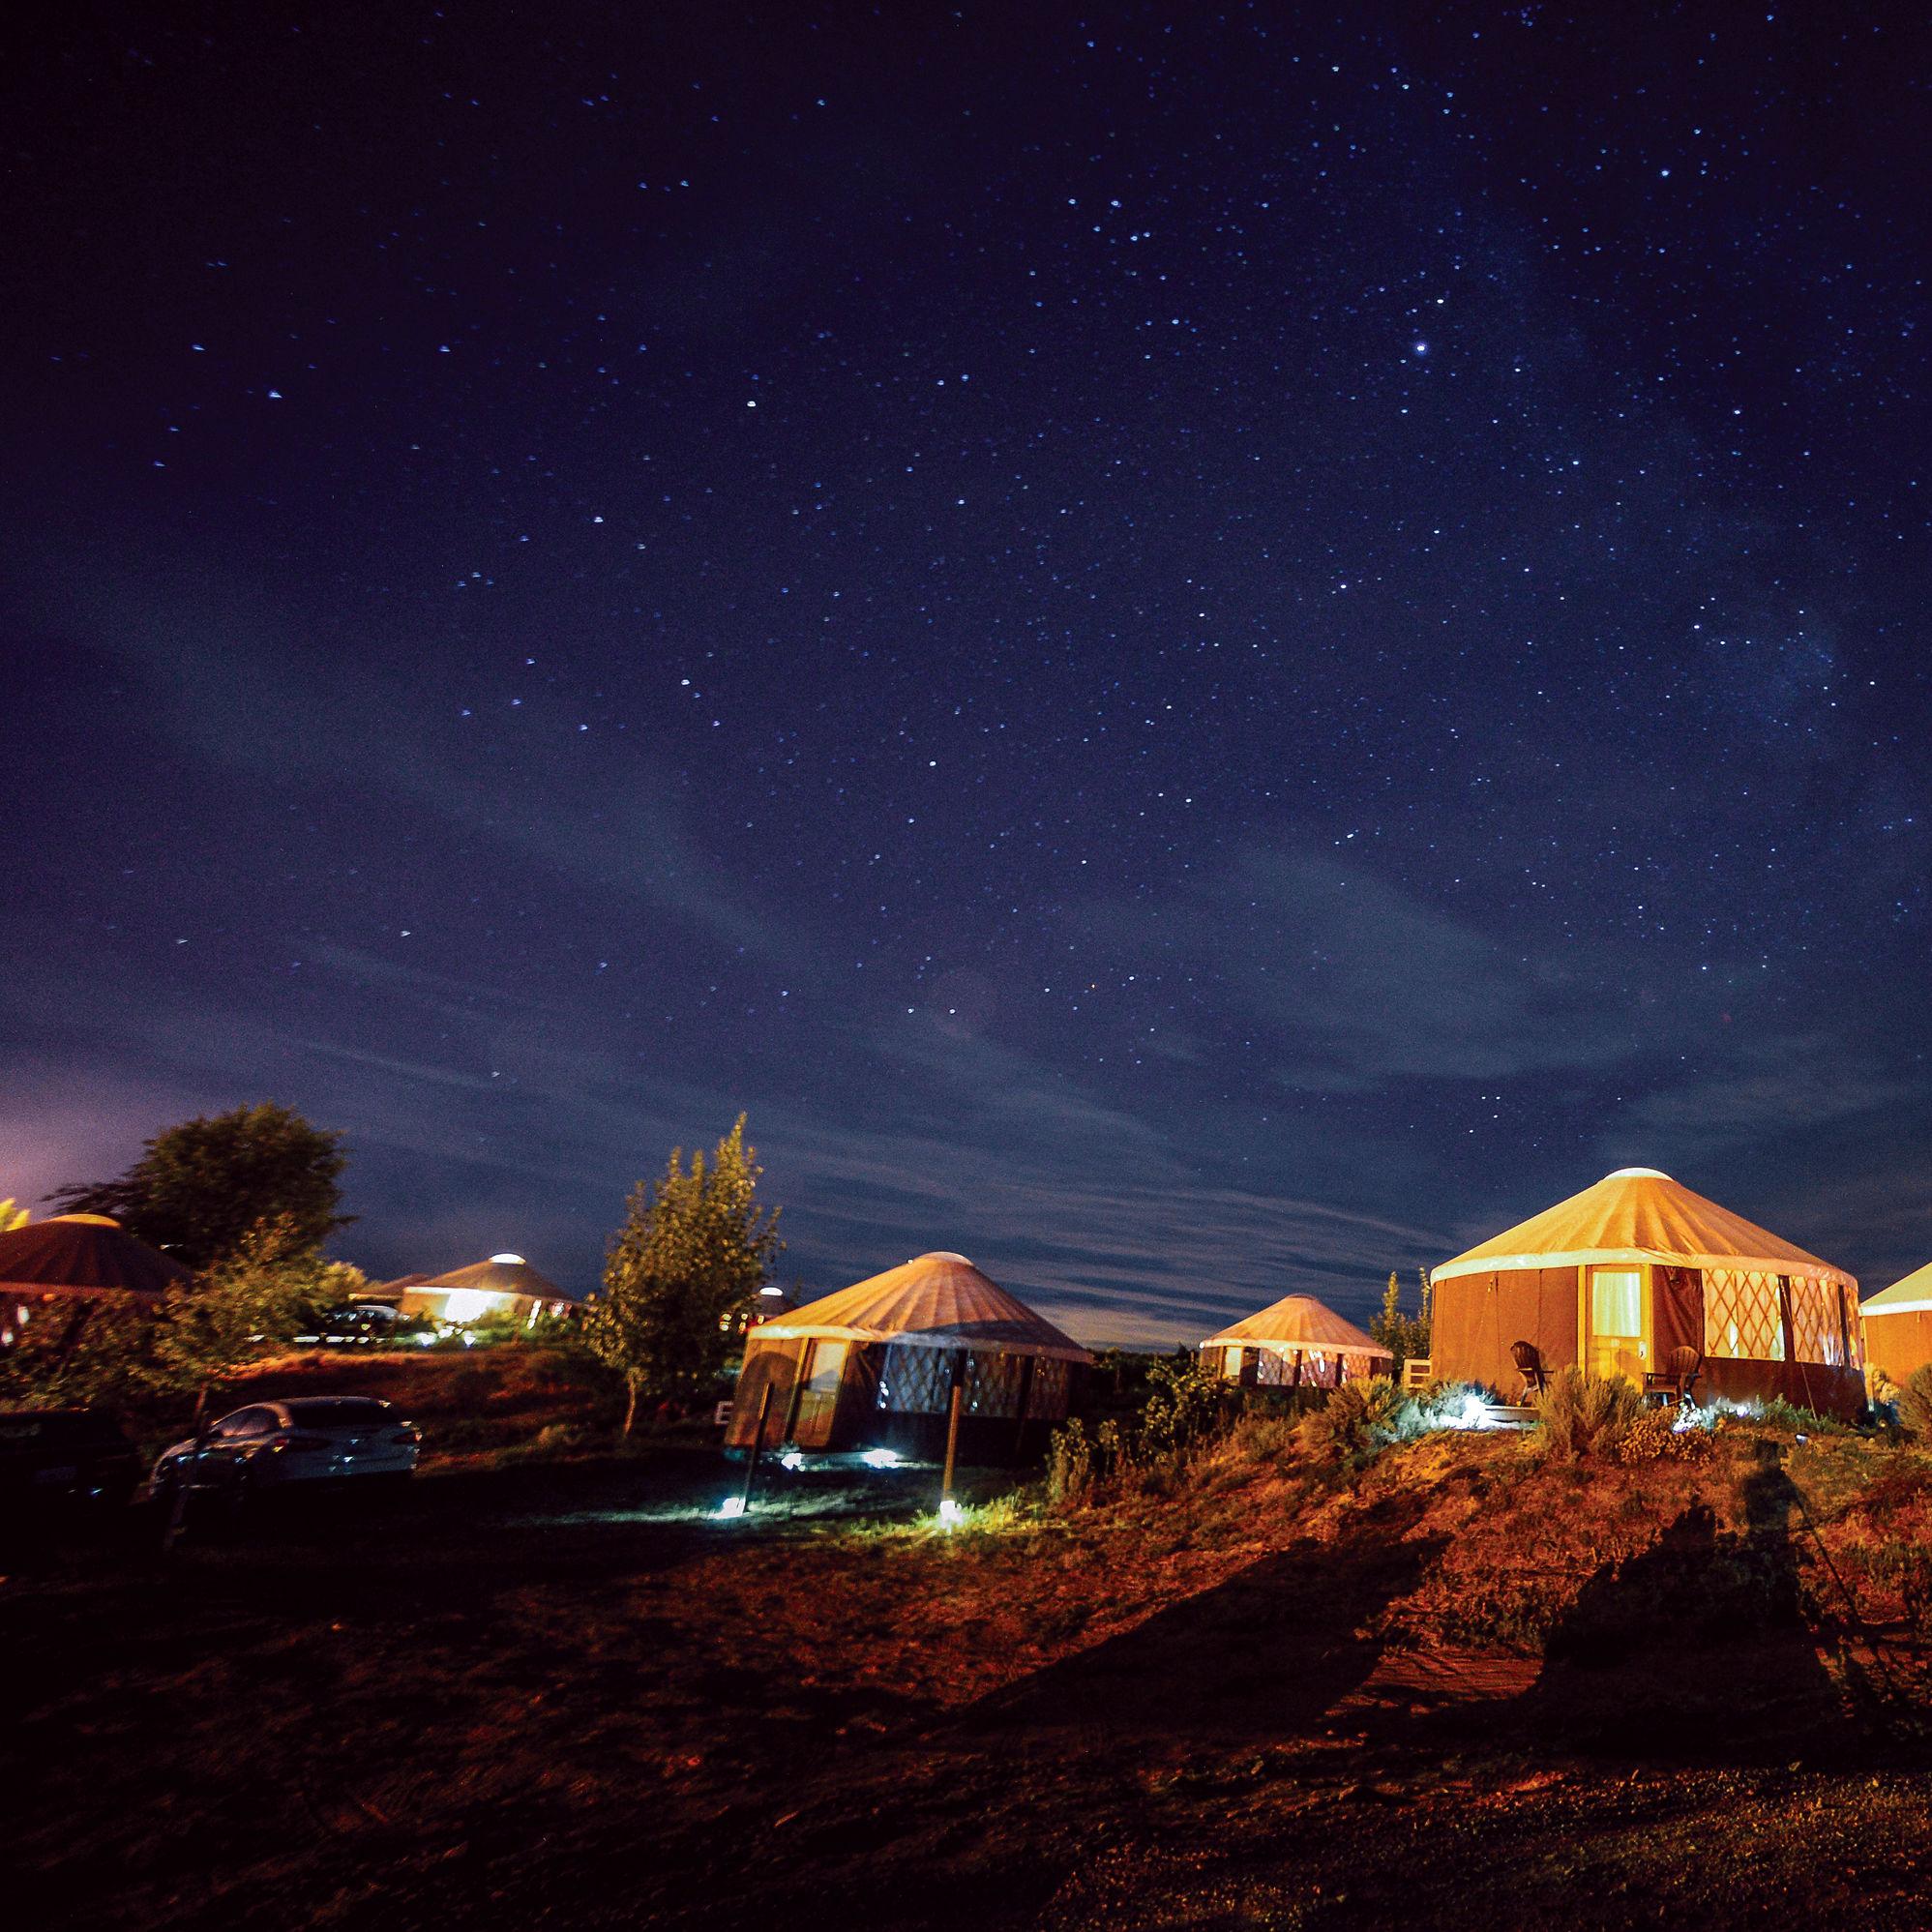 Caveb yurt jerometsophotography lrjeeu